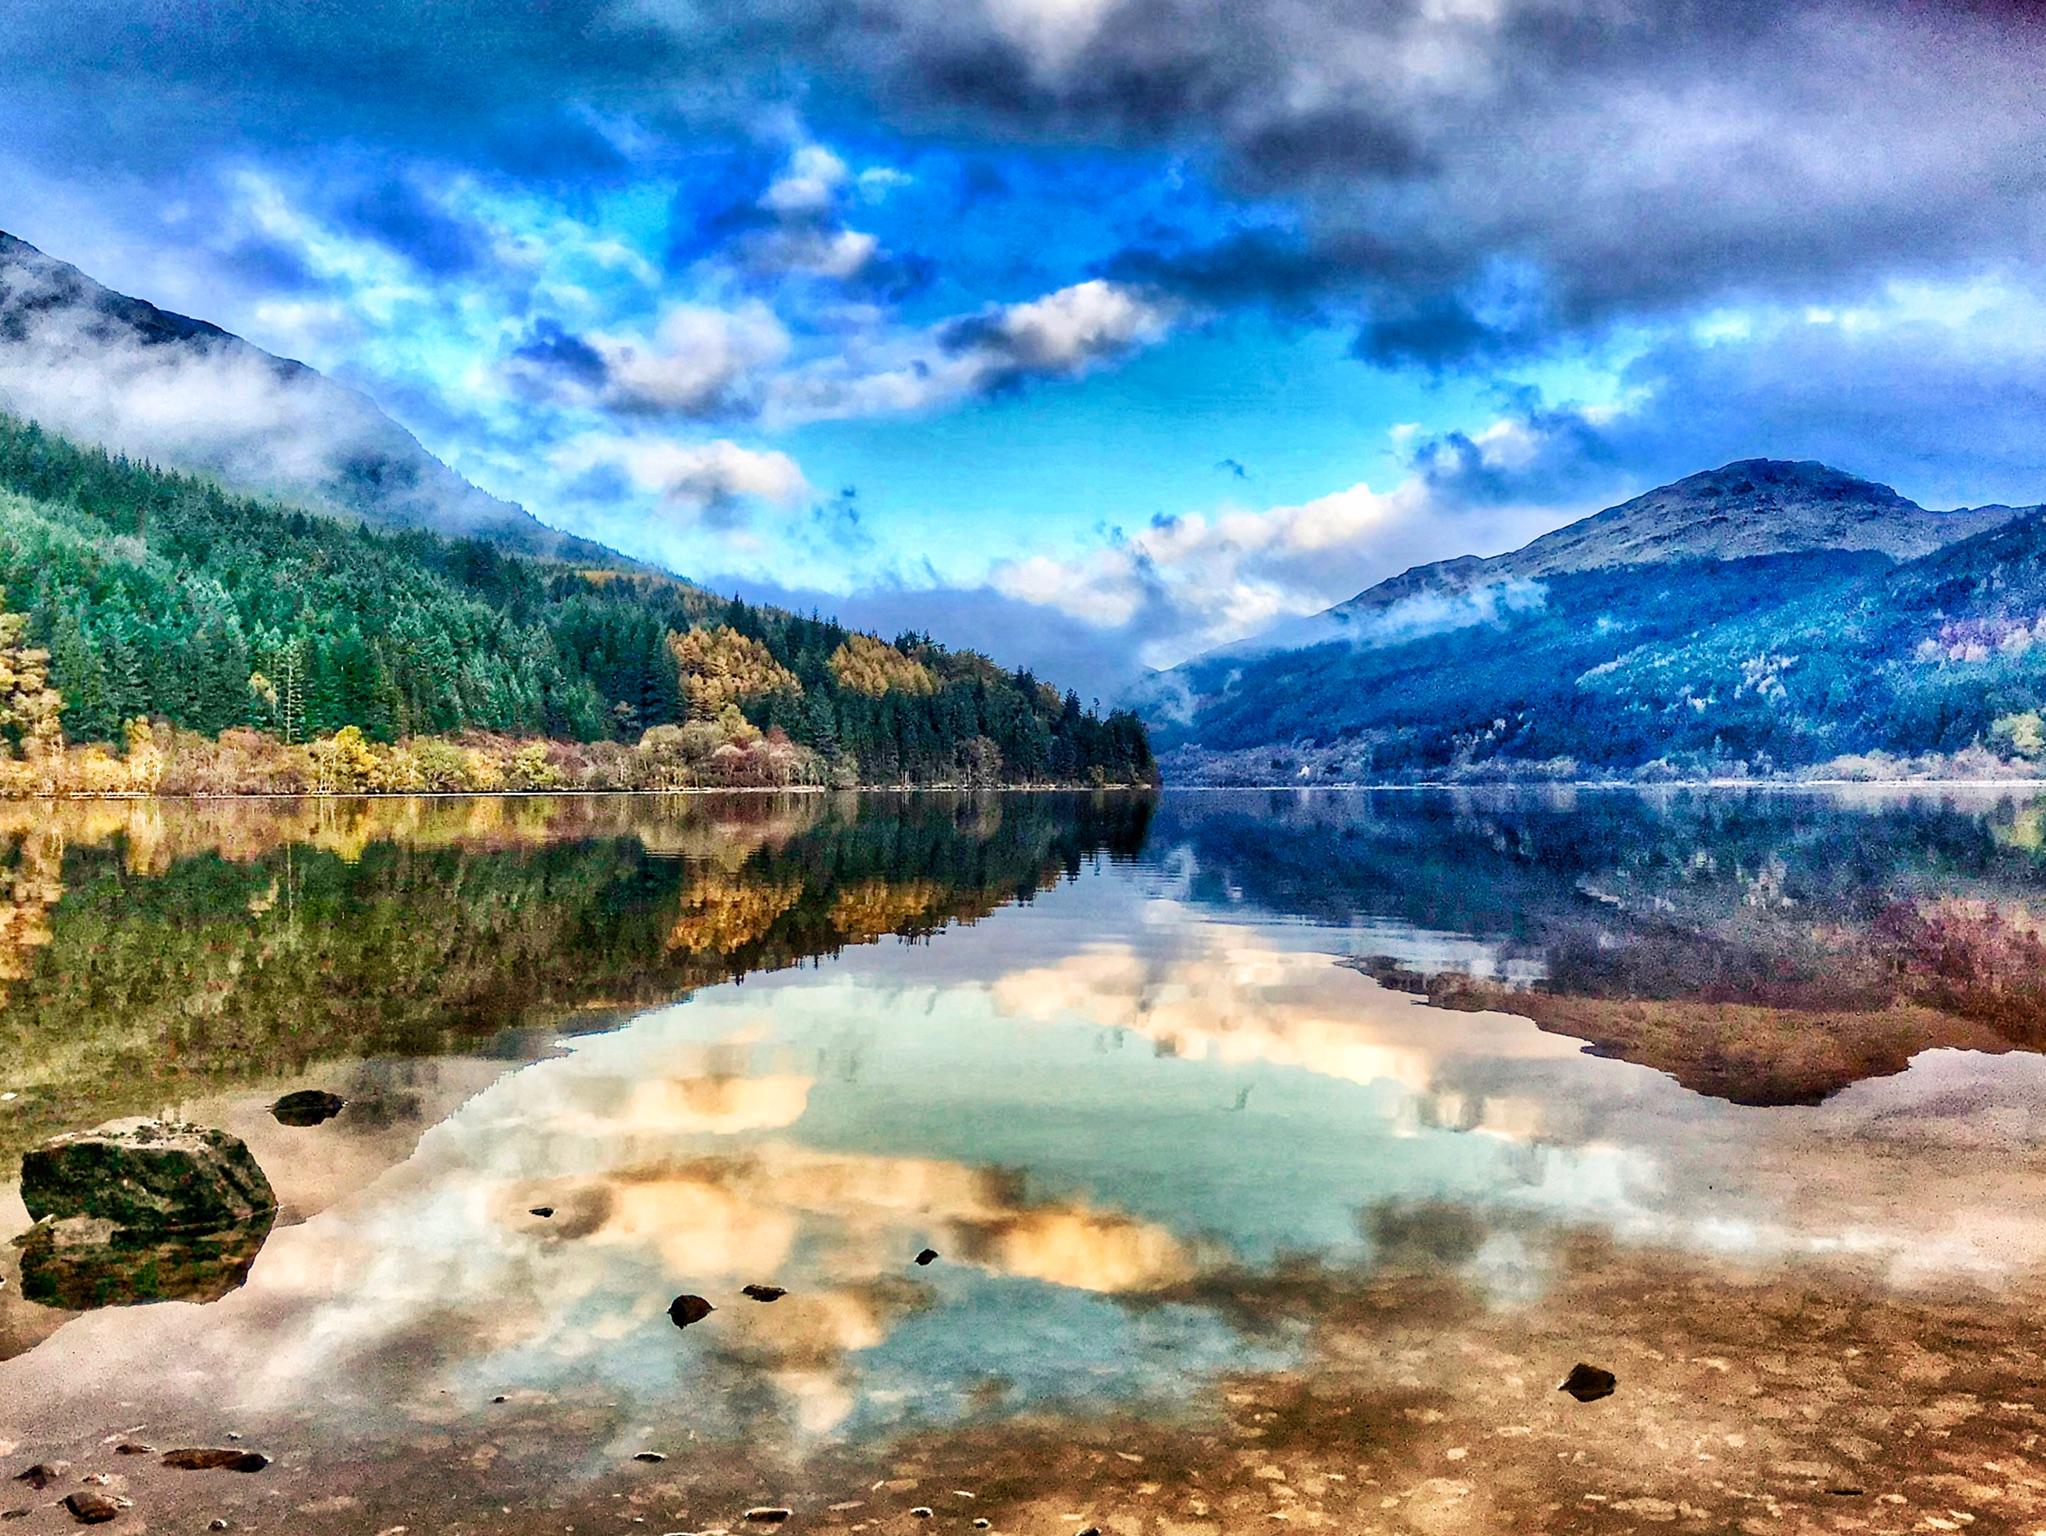 Loch Eck, Argyle Forest, Scotland, United Kingdom